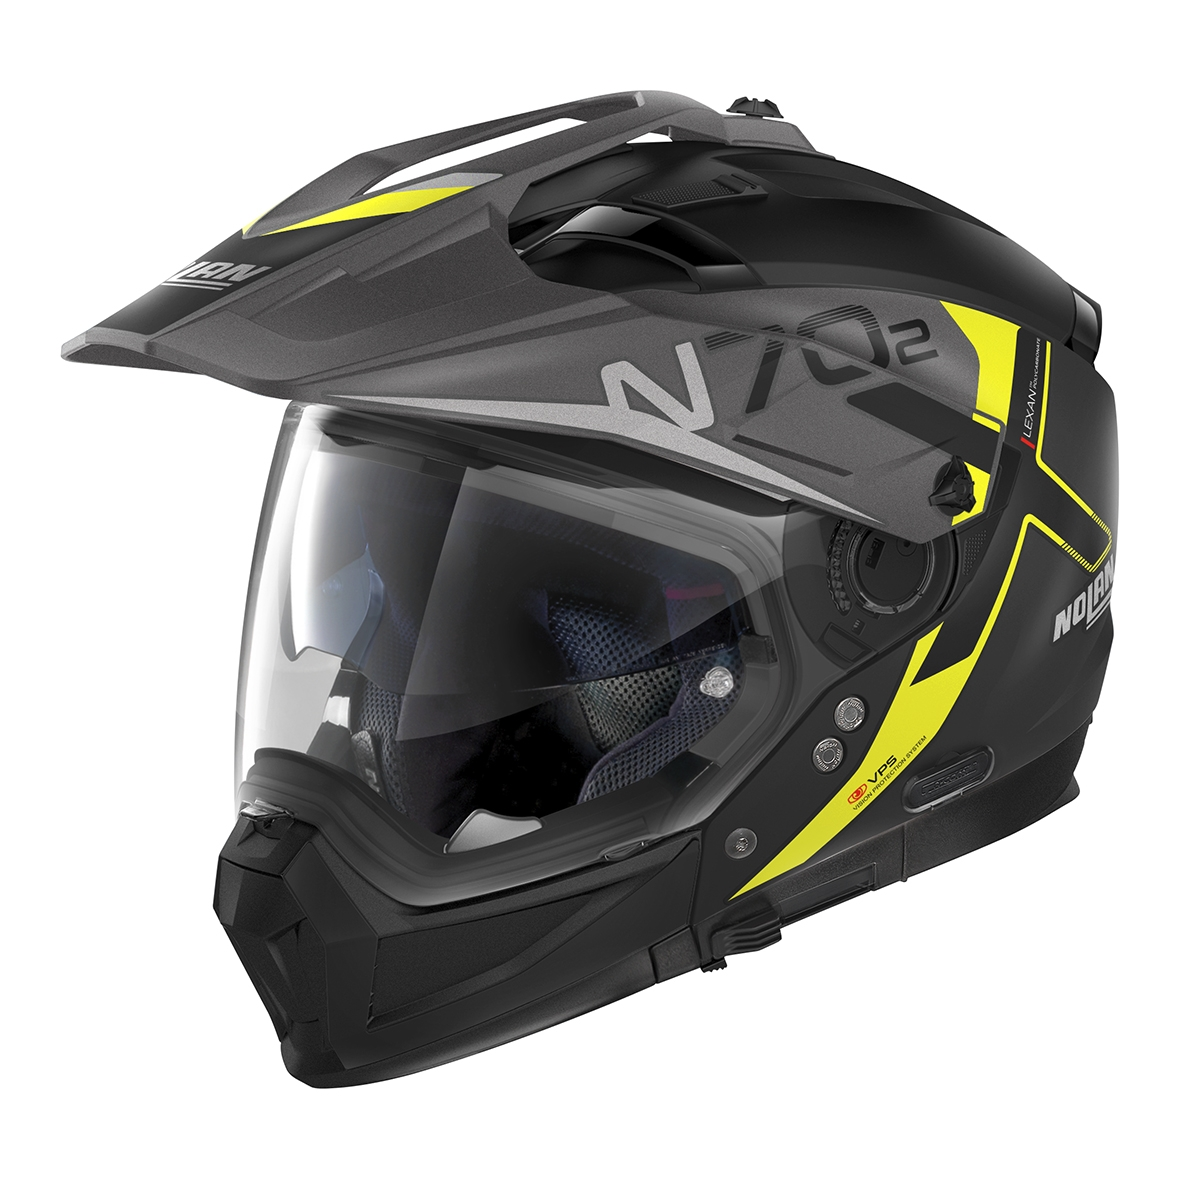 Moto helma Nolan N70-2 X Bungee N-Com Flat Black 36